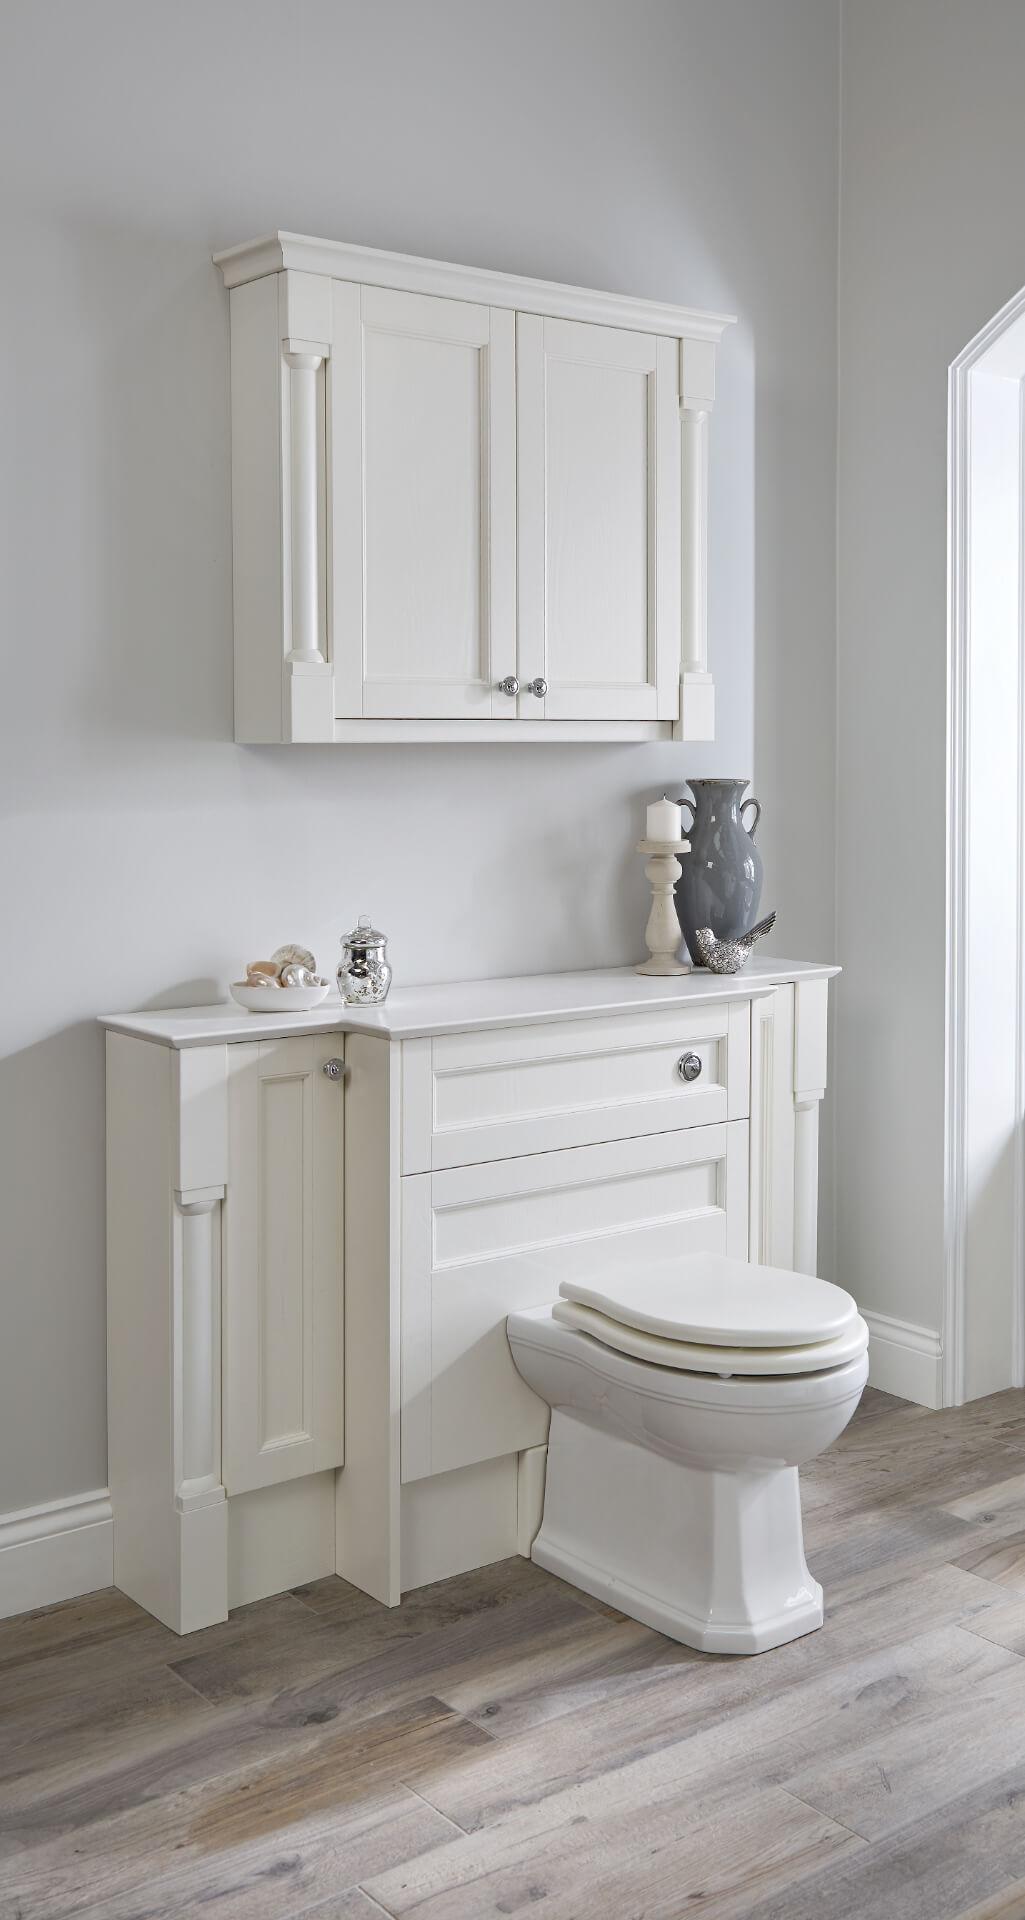 Utopia Bathroom Qube White Toilet Unit